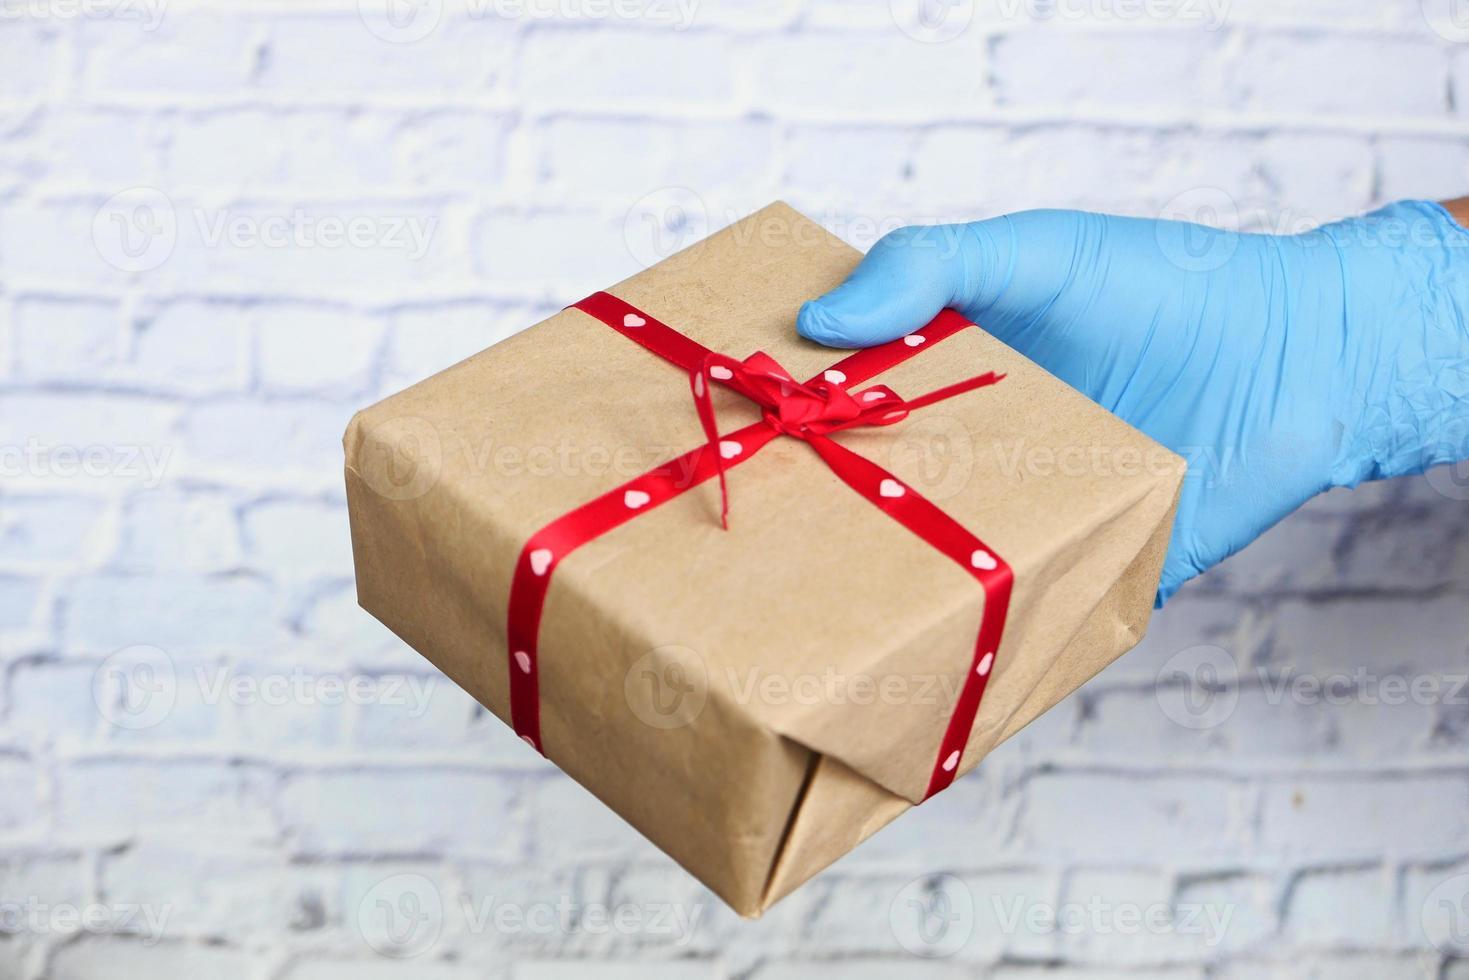 mano sosteniendo un regalo foto